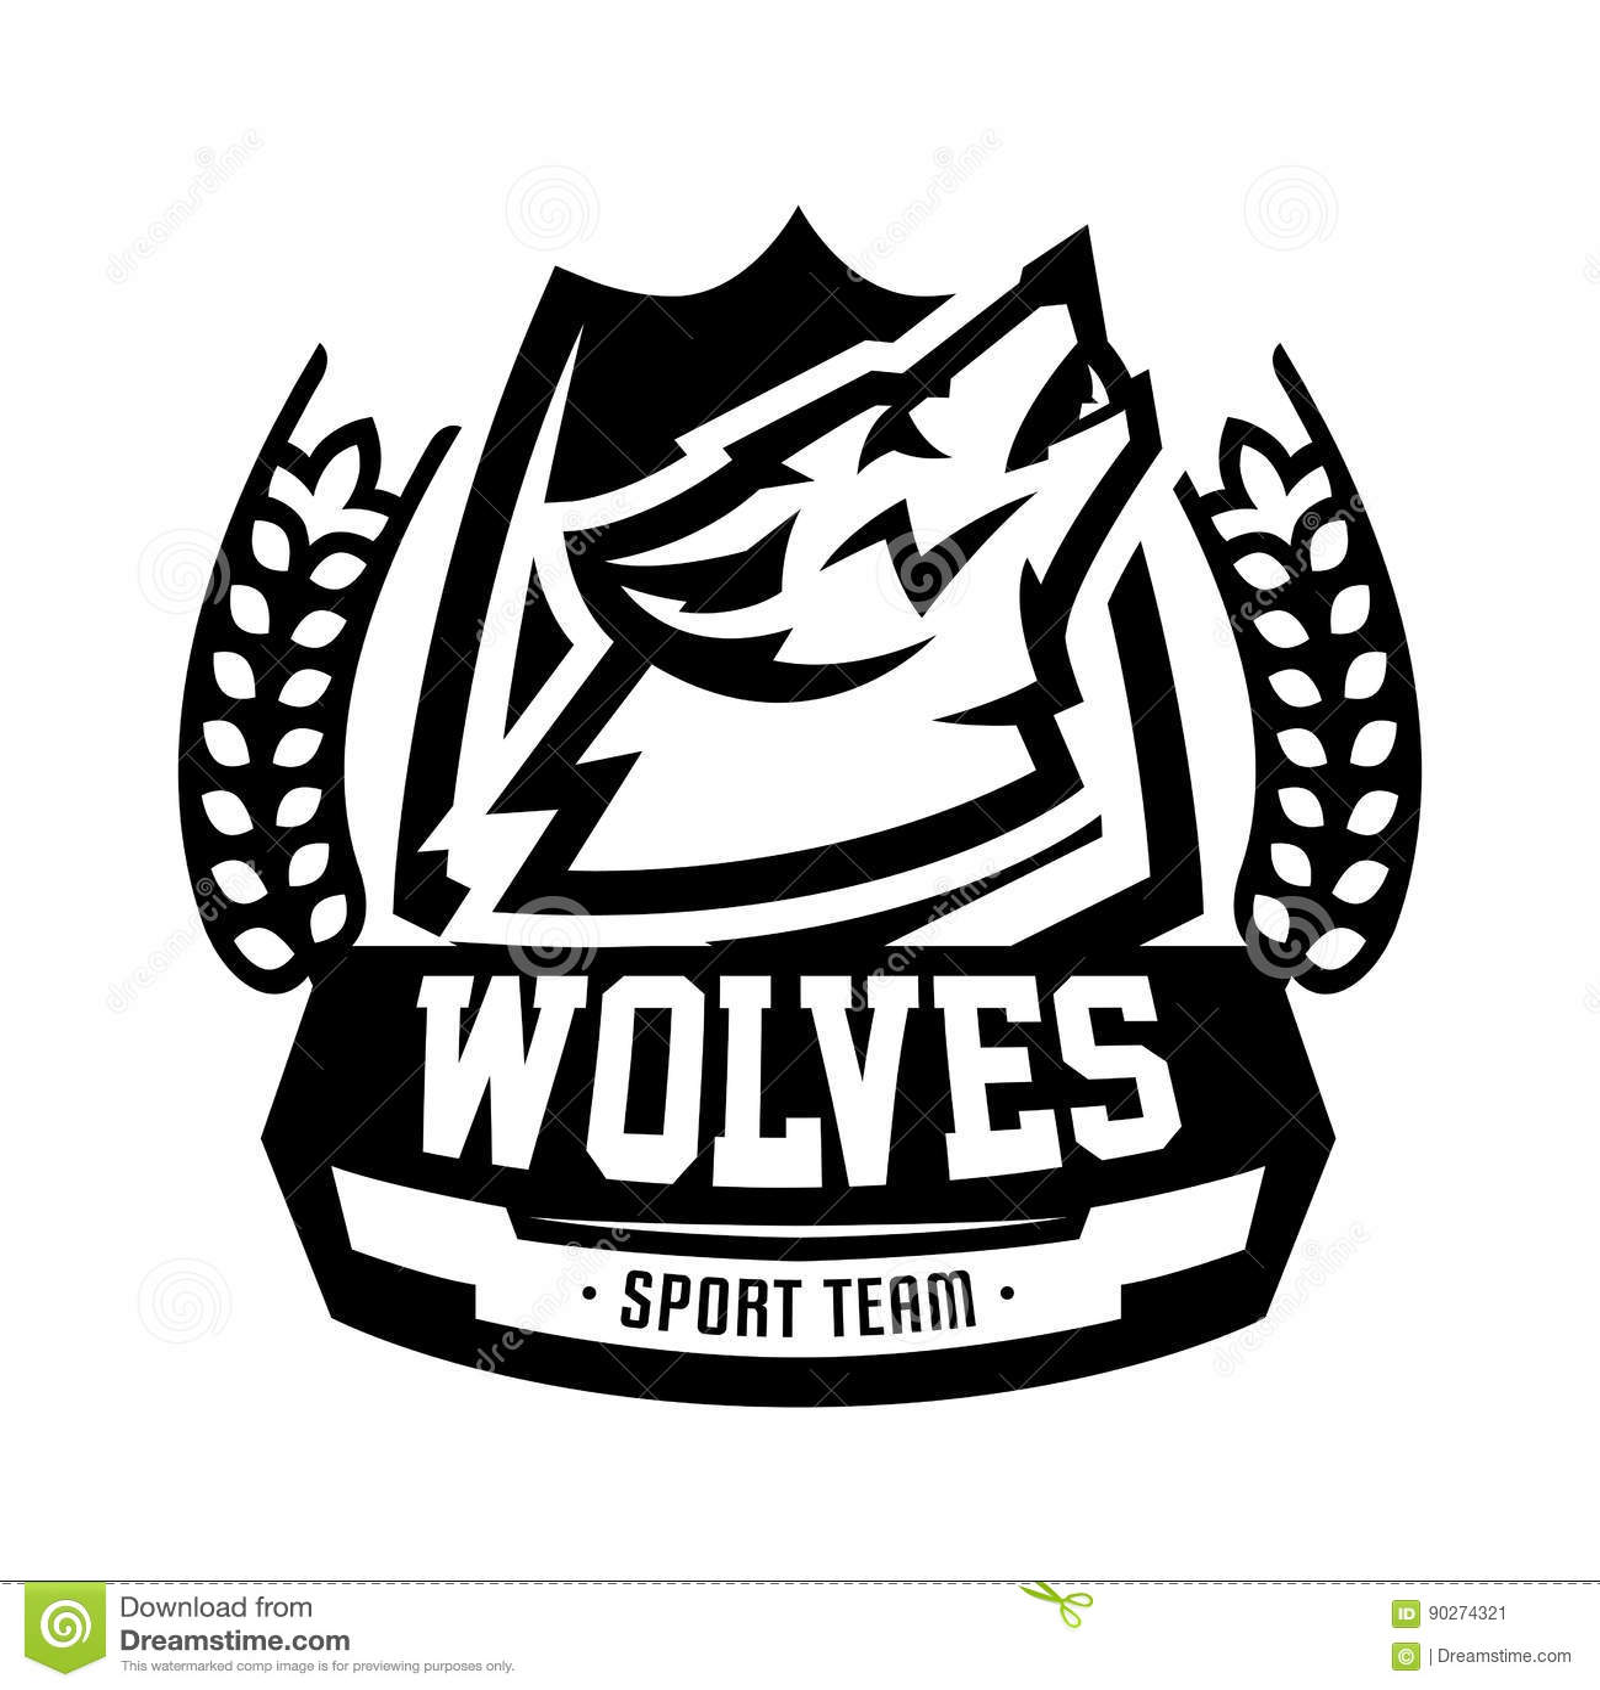 Monochrome логотип, эмблема, волк завывать